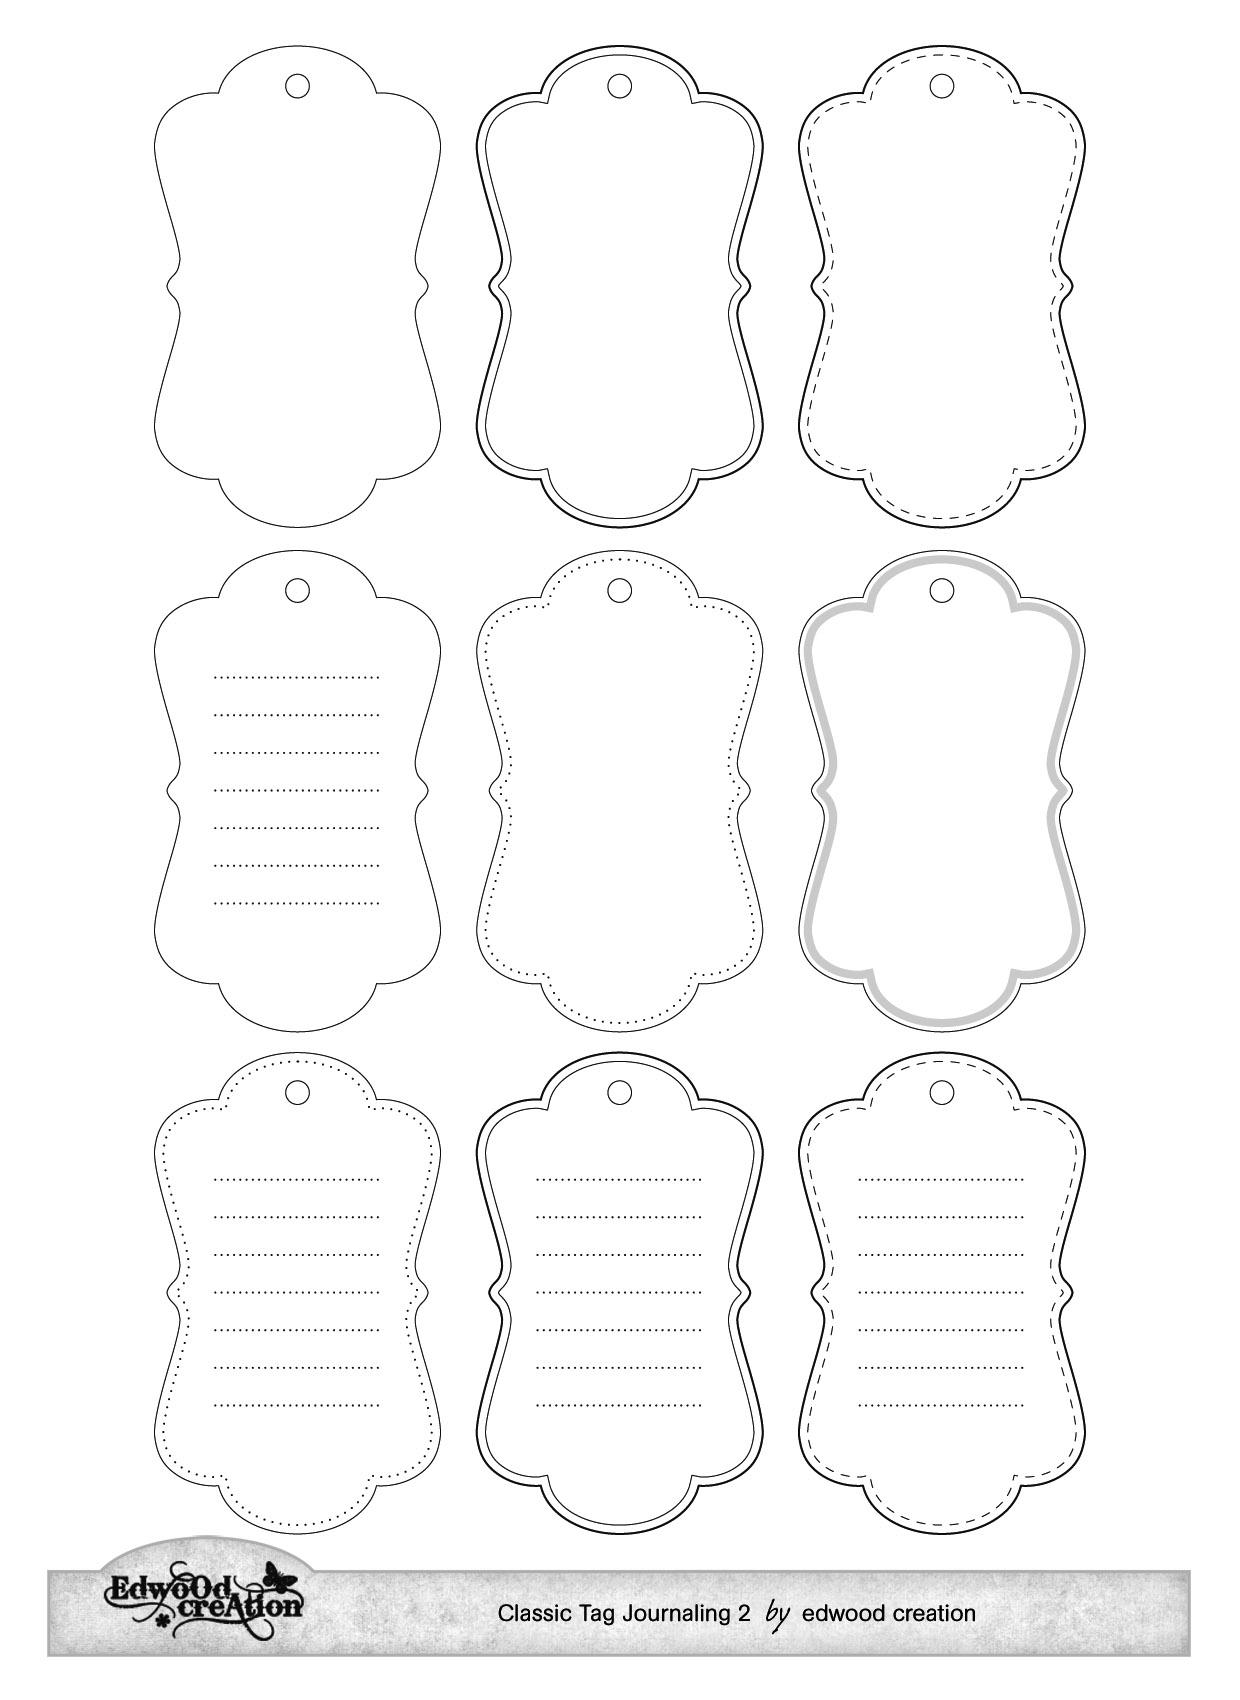 scrapbooking etiquettes edwood creation. Black Bedroom Furniture Sets. Home Design Ideas